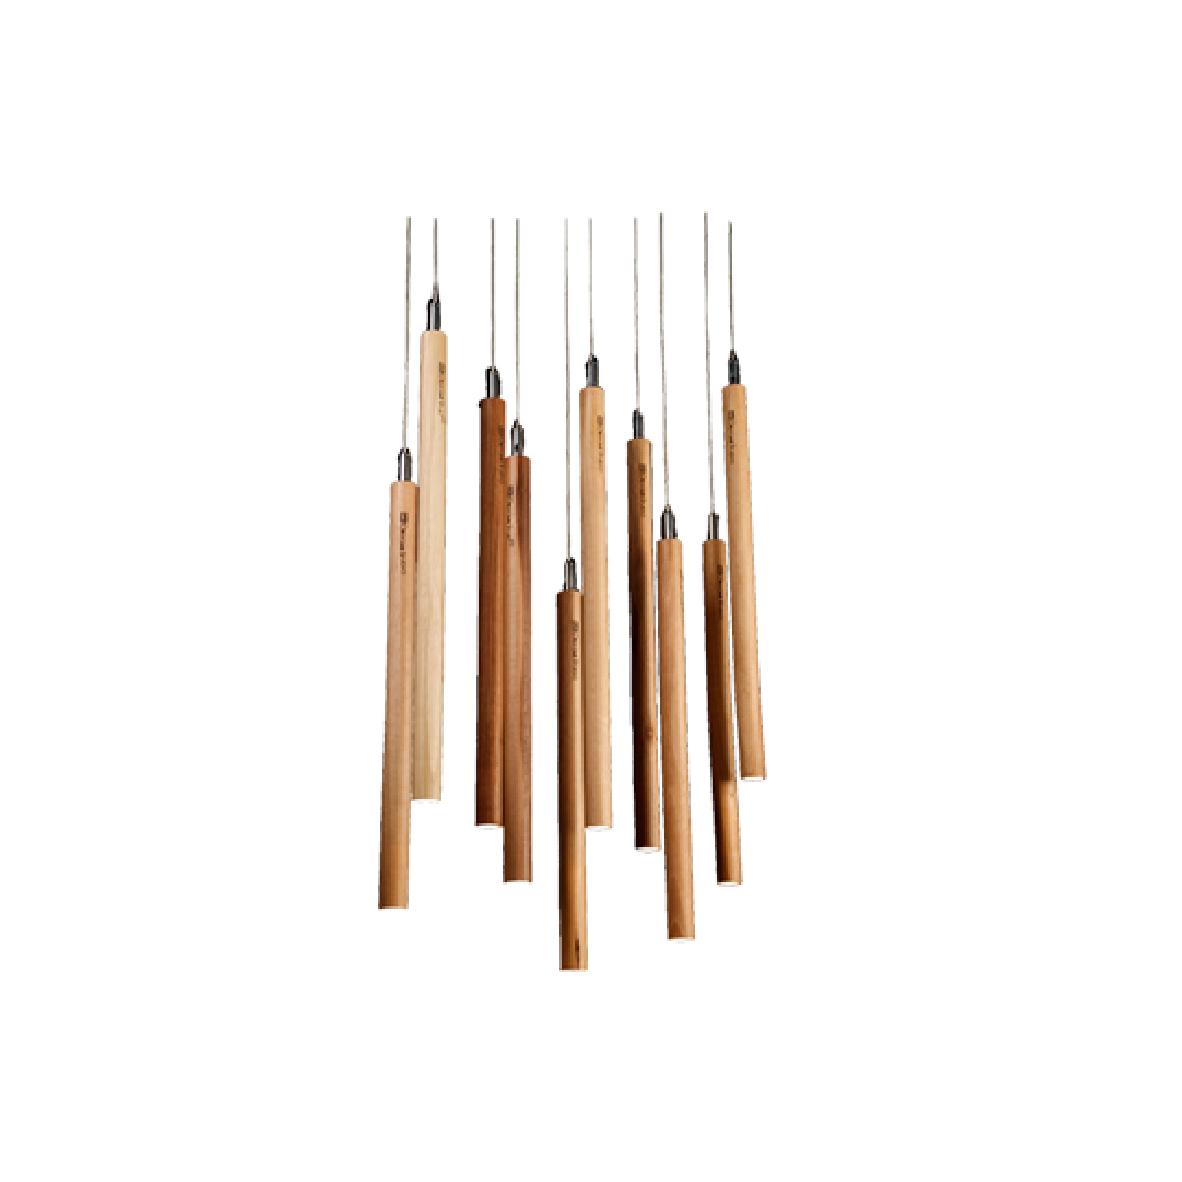 چراغ دکوراتیو چوبی SO-1381-50CM-Lآویز